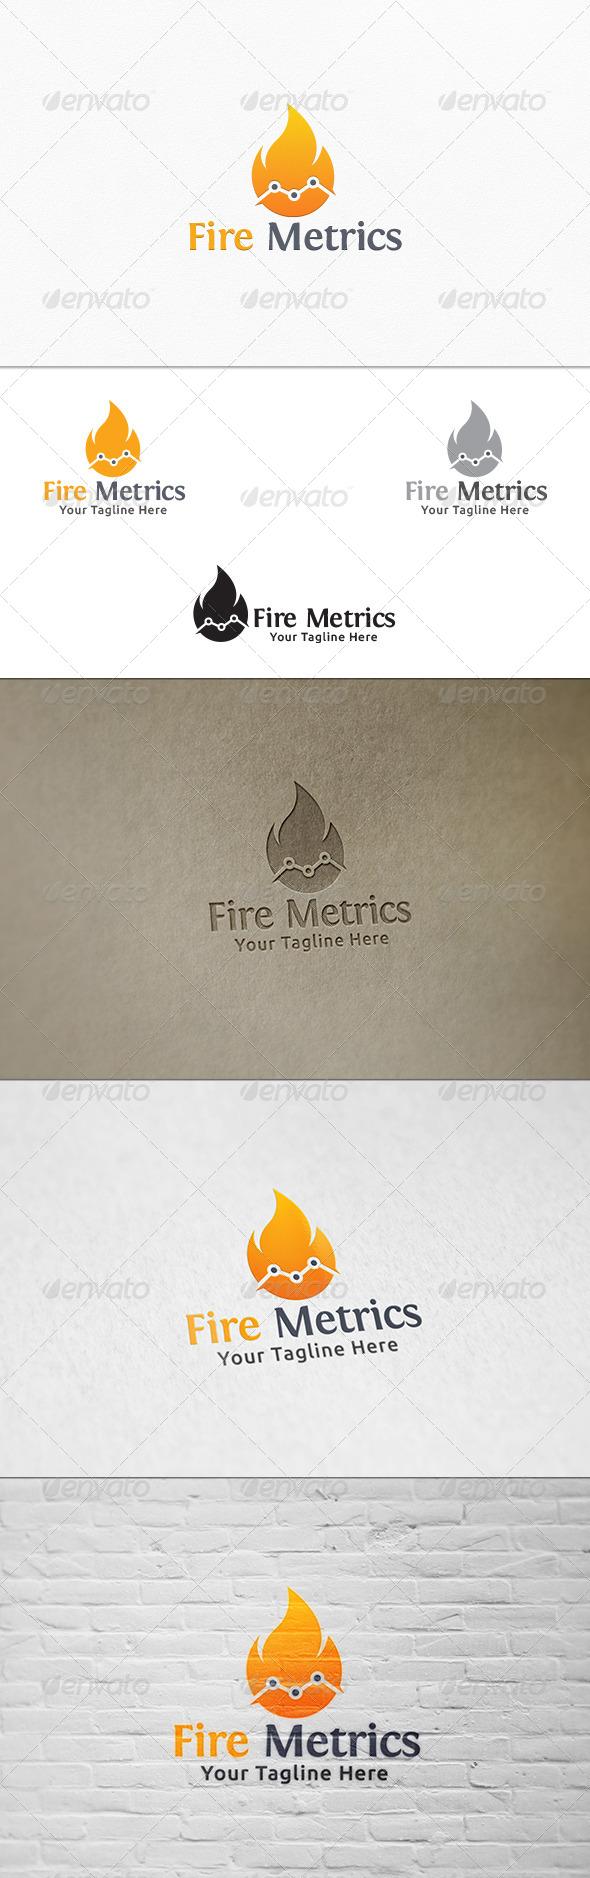 Fire Metrics - Logo Template